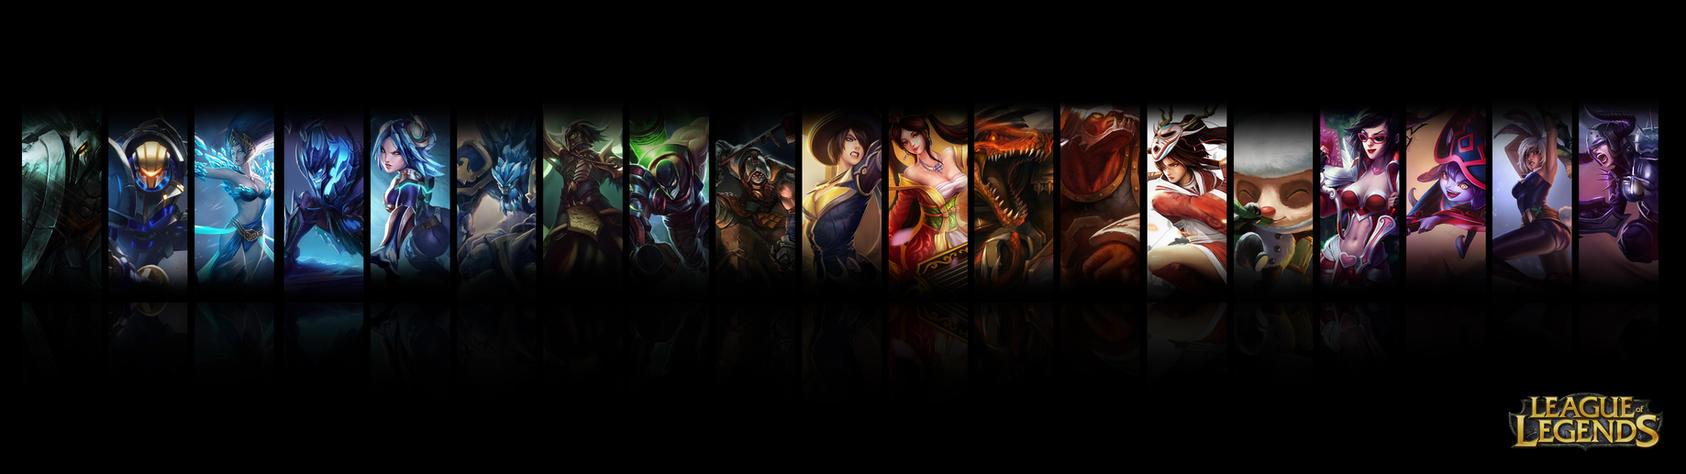 League Of Legends Dual Screen Wallpaper By Jrkdo